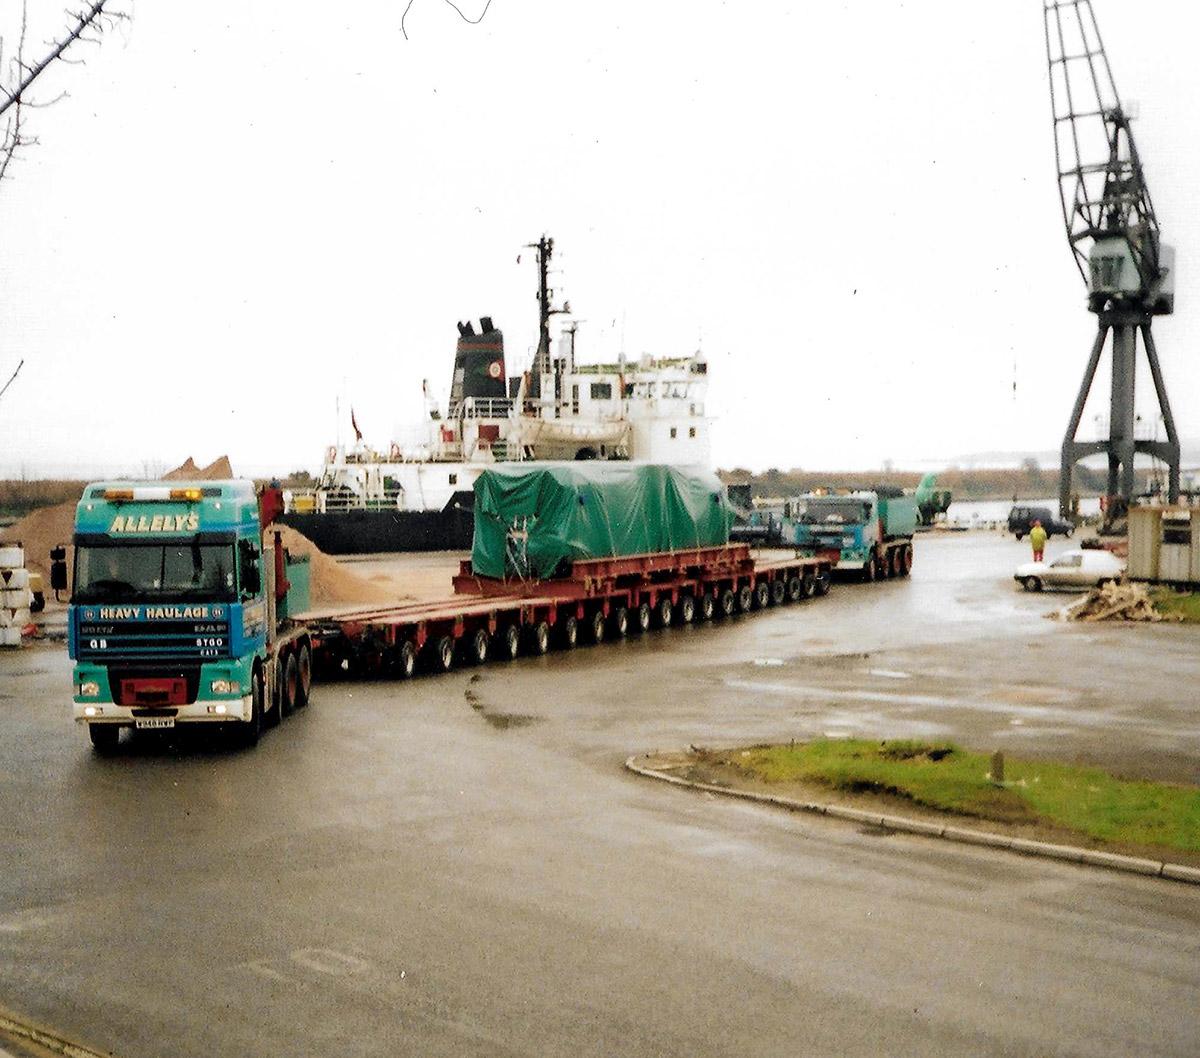 Allelys Heavy Long Vehicle Haulage Road Transport